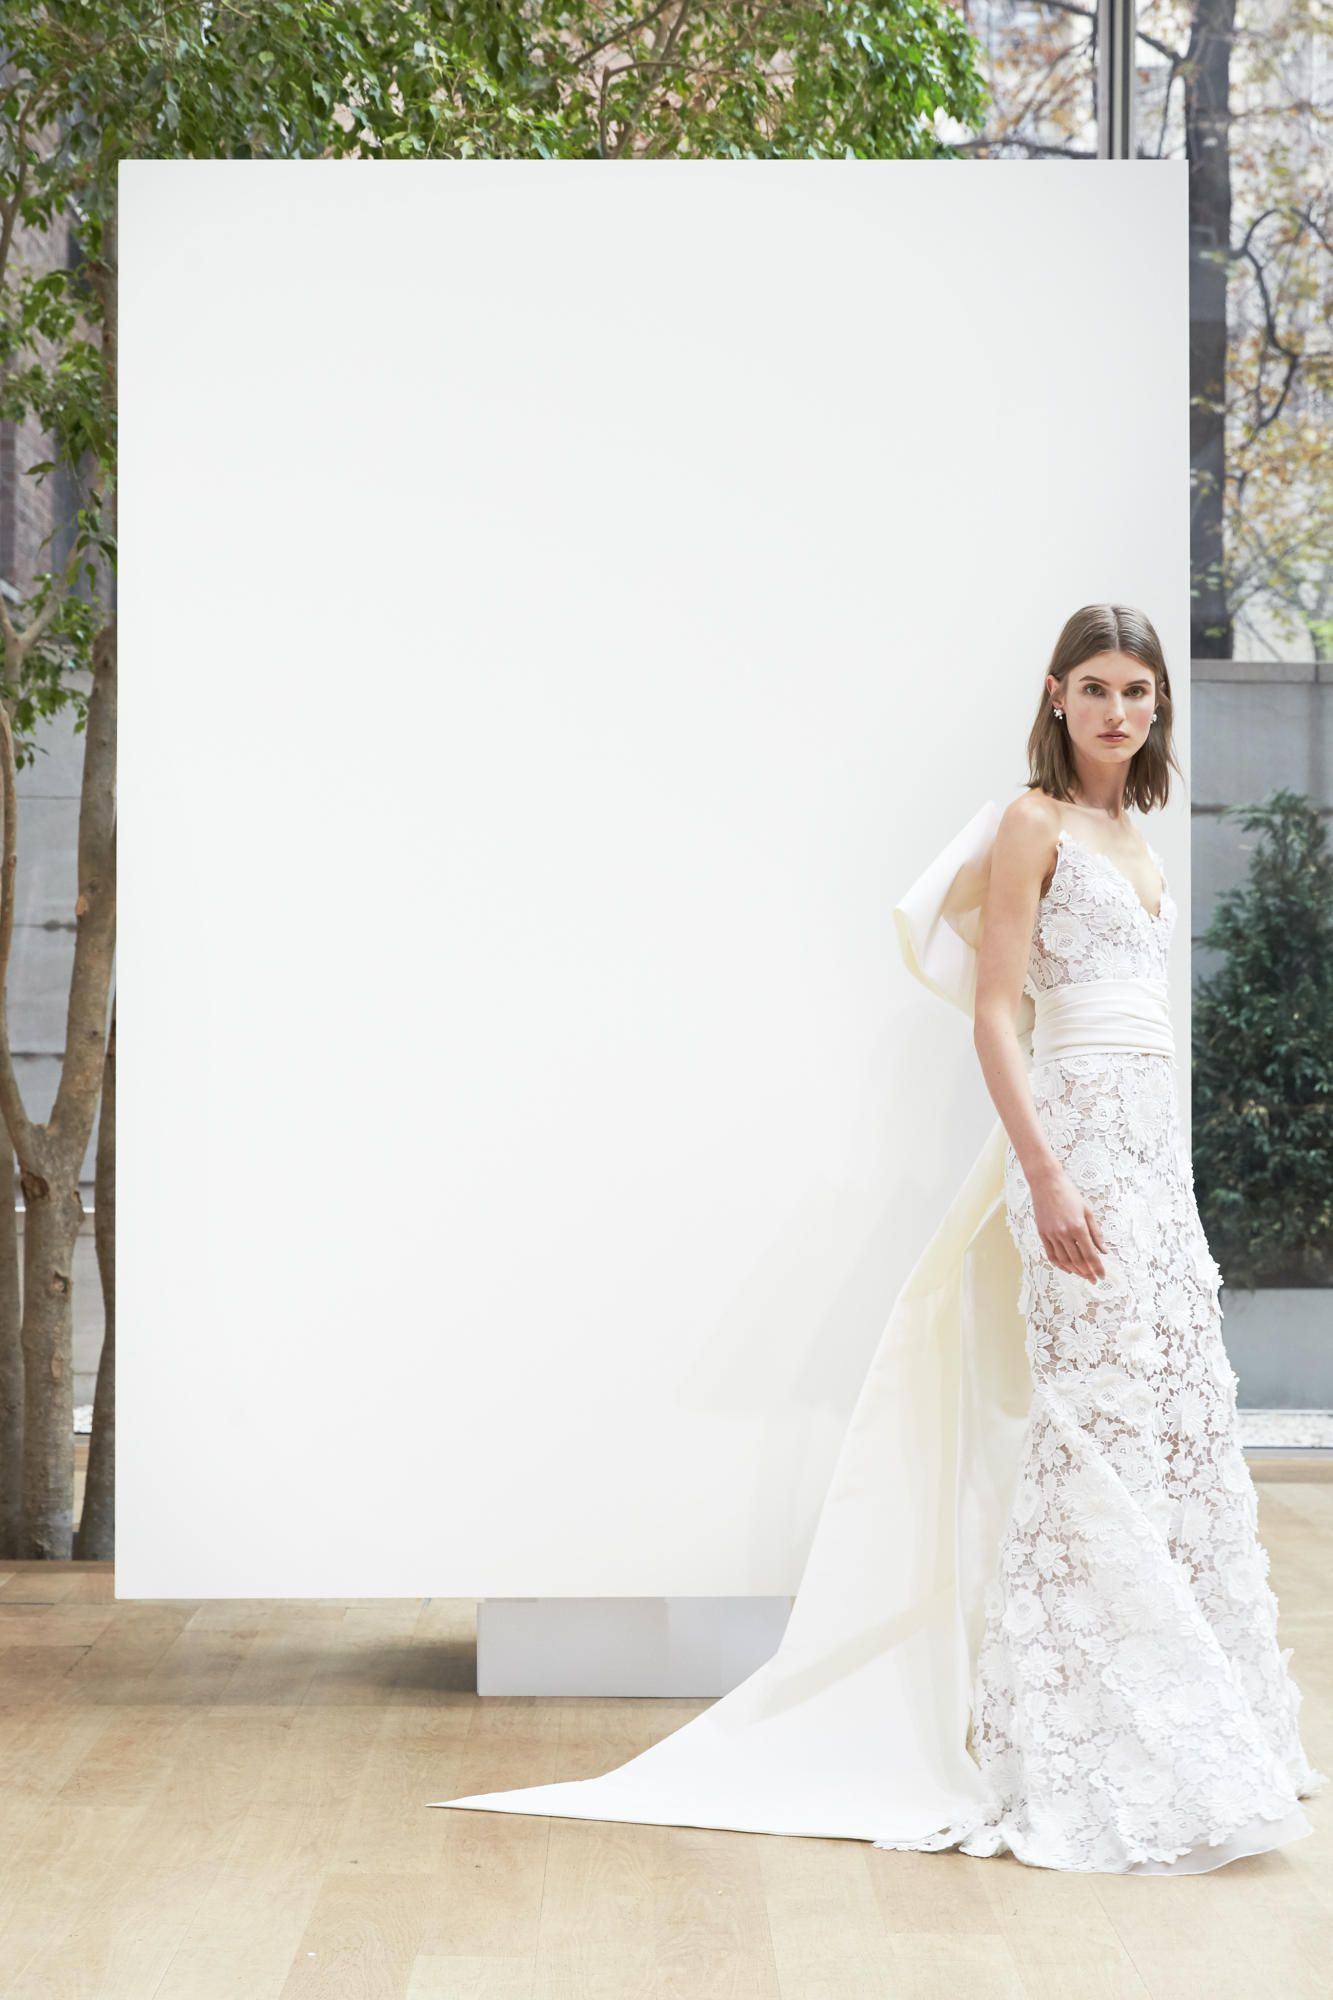 oscar-de-la-renta-bridal-spring-2018-belt-dress Tendências de vestidos de noiva para 2018